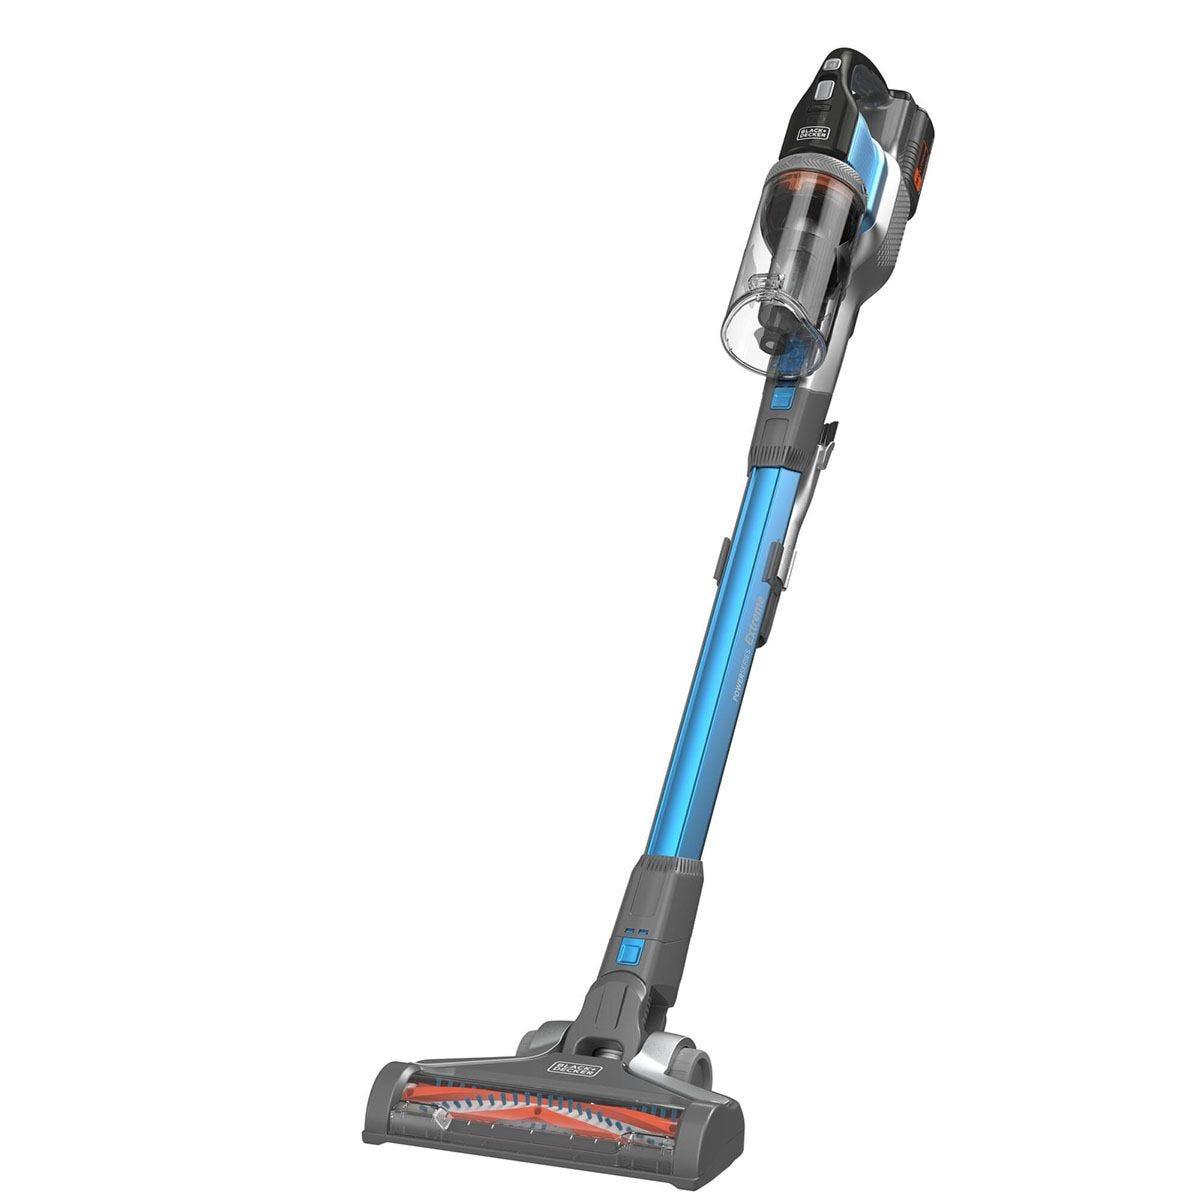 Black & Decker BHFEV362D-GB PowerSeries Floor Extension Cordless Stick Vacuum Cleaner - Grey